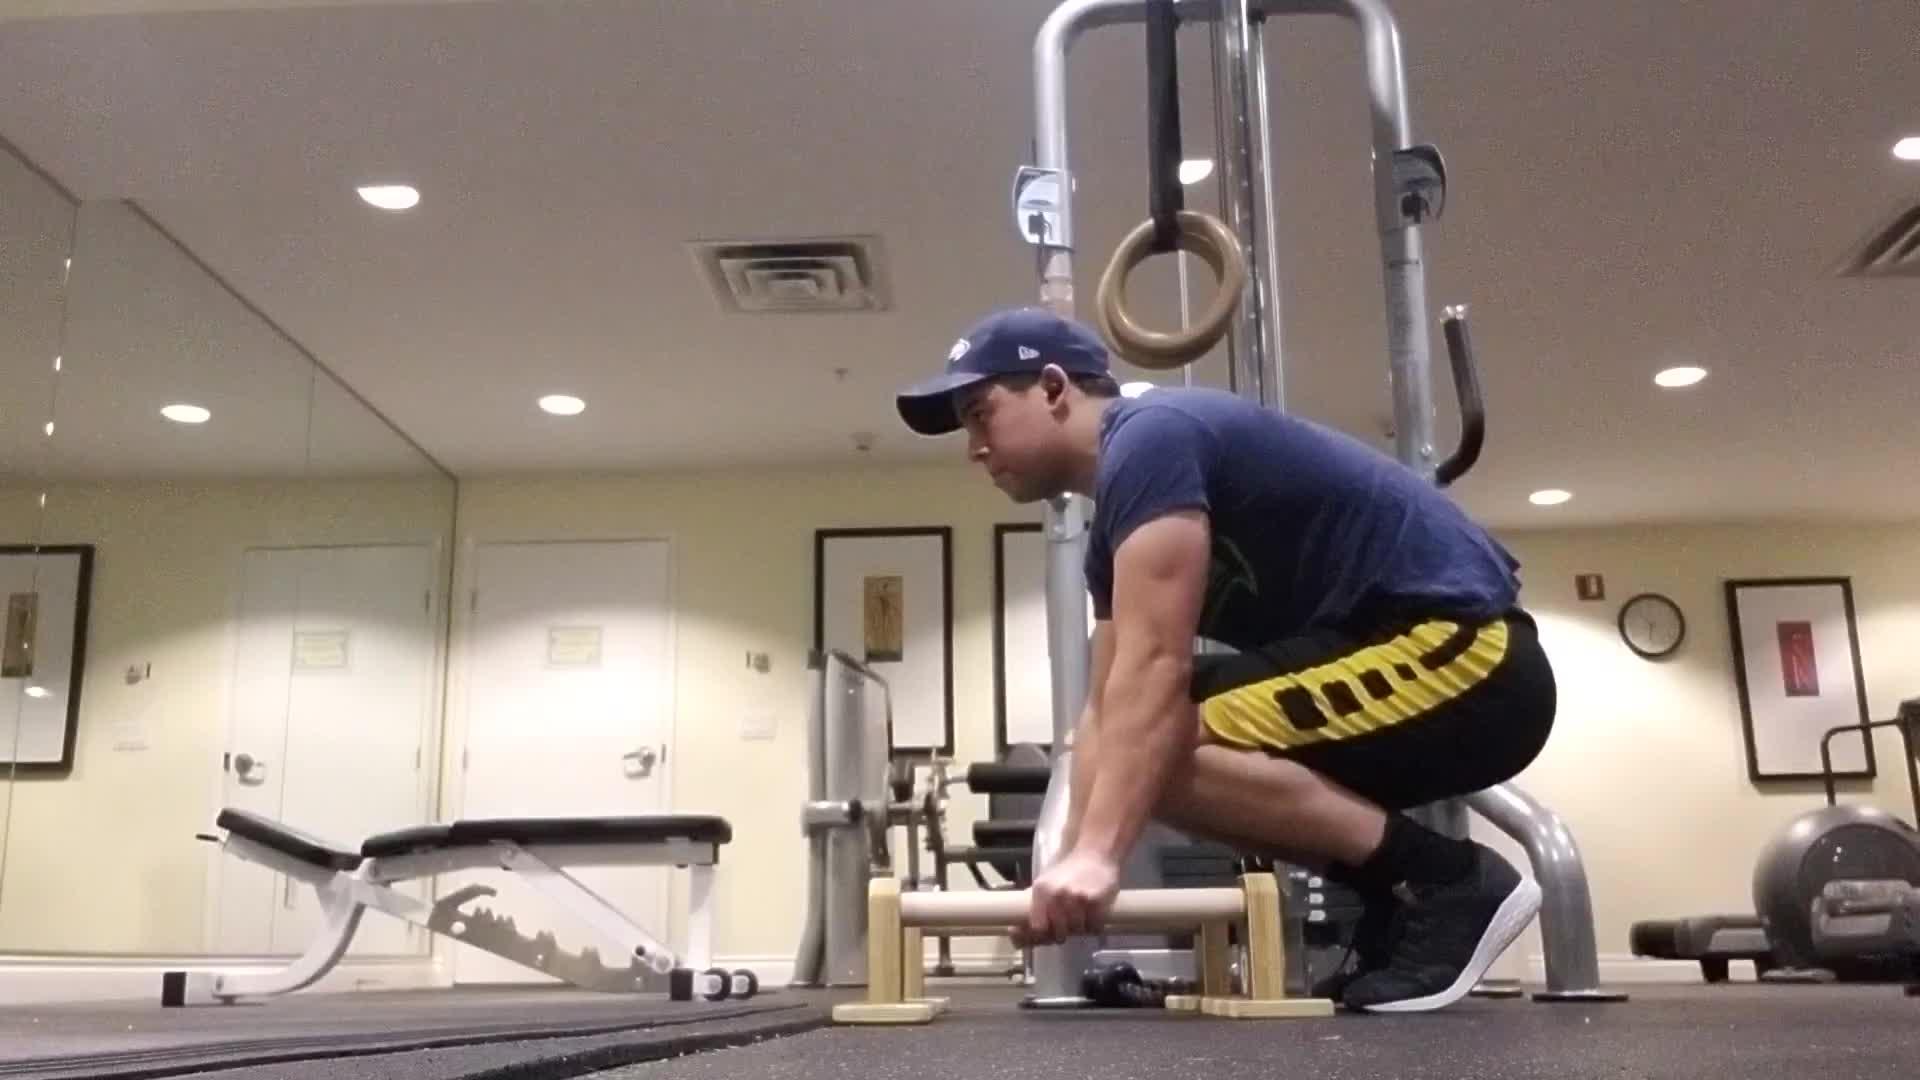 bodyweightfitness, 3s Tuck Planche GIFs